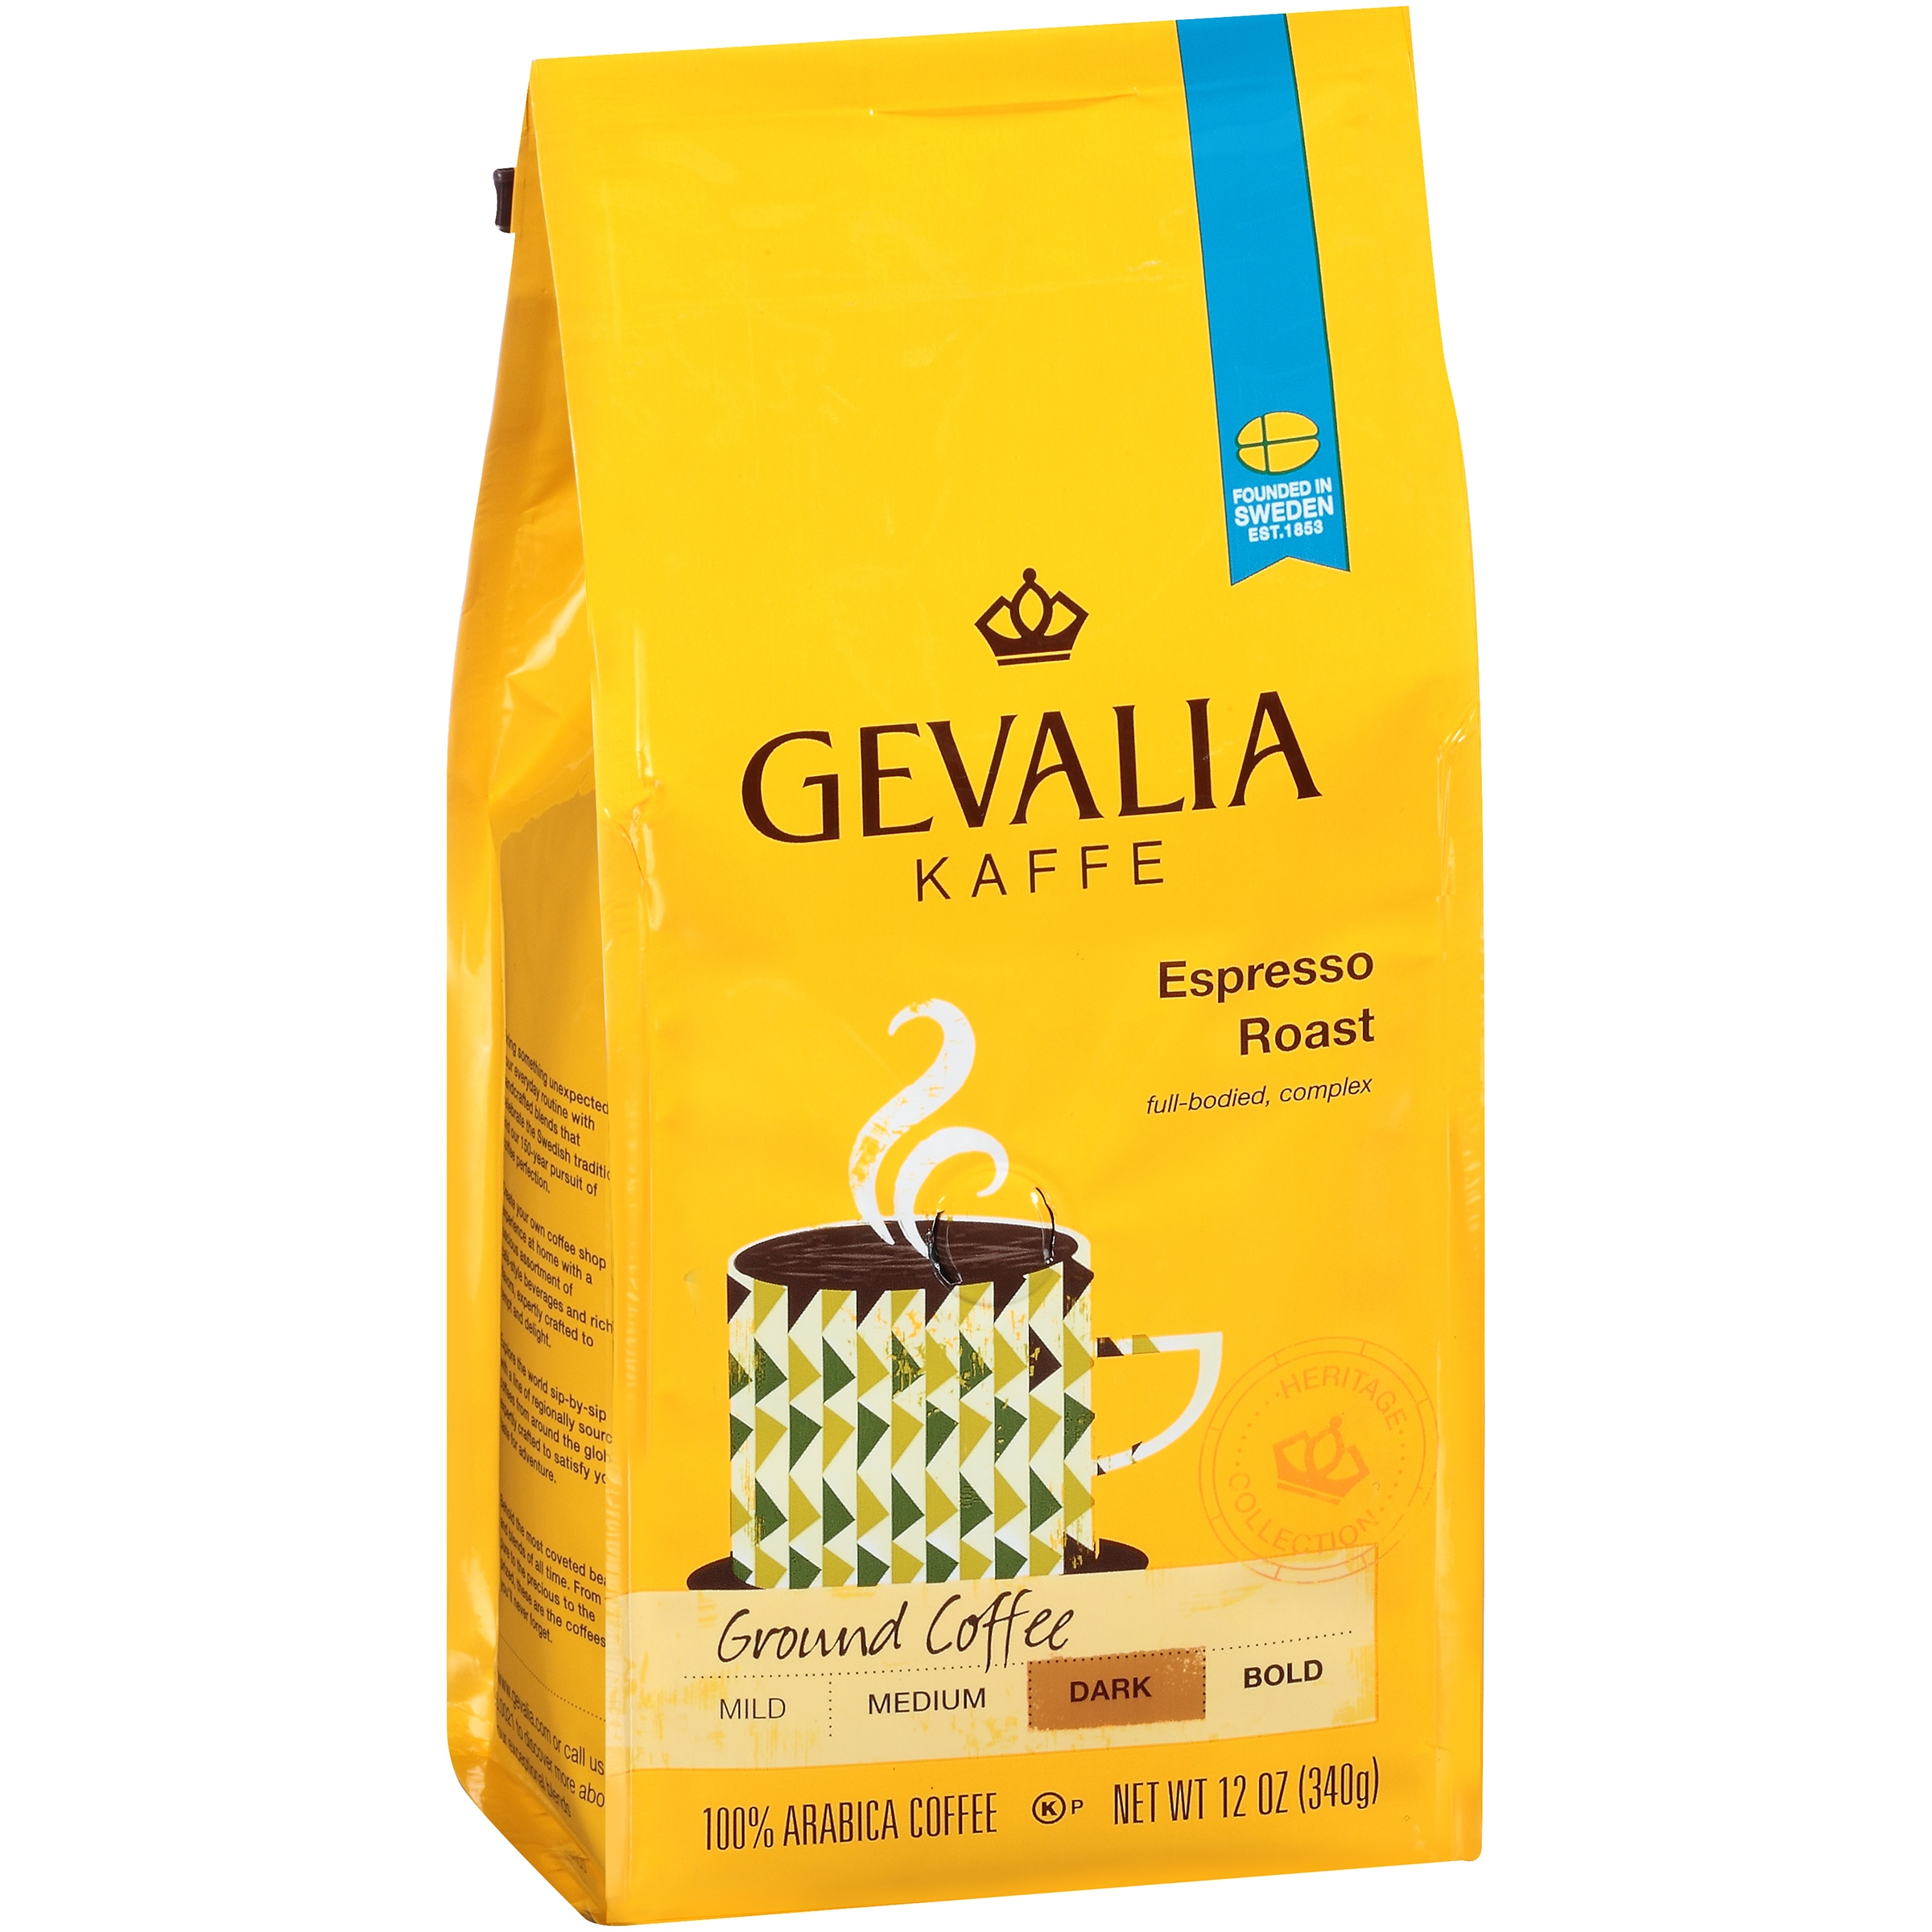 Gevalia Kaffe Espresso Dark Roast Ground Coffee, 12 OZ (340g) by Gevalia Kaffe Import Service